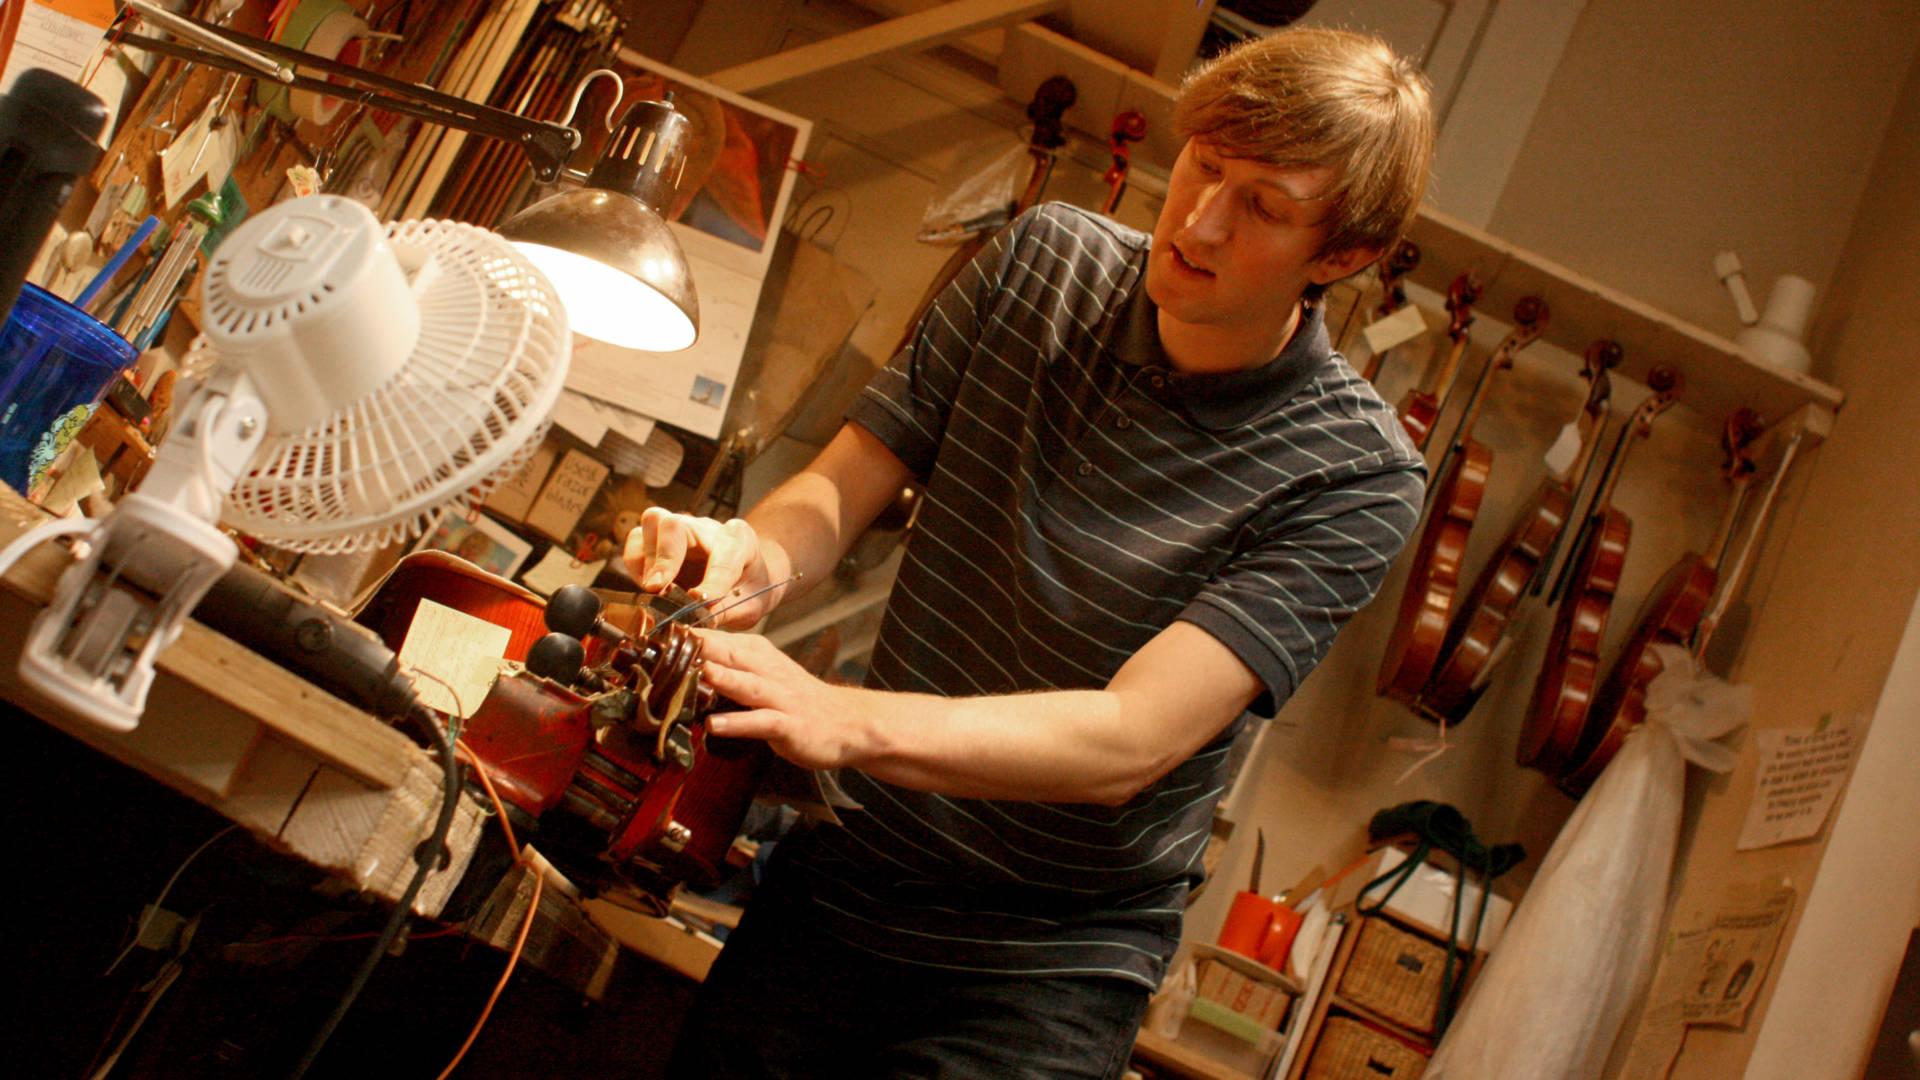 Julian Loveland works on a cello in his family's Santa Rosa shop.